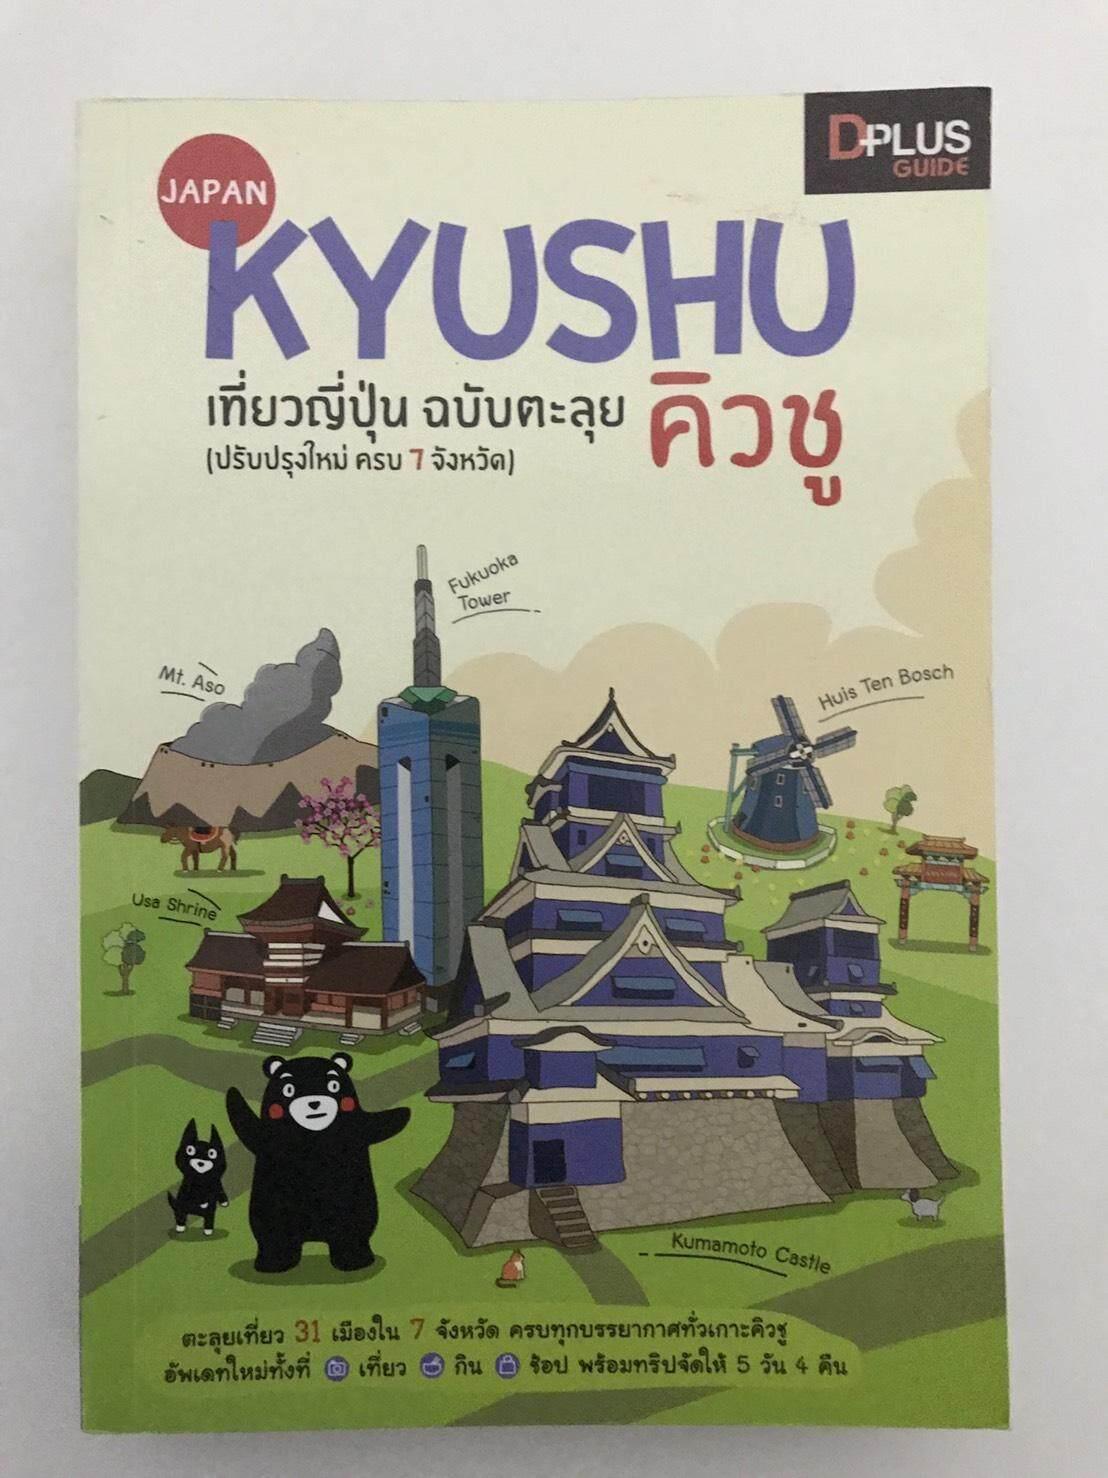 Kyushu เที่ยวญี่ปุ่น ฉบับตะลุย คิวชู ปรับปรุงใหม่ By Bbook Store.